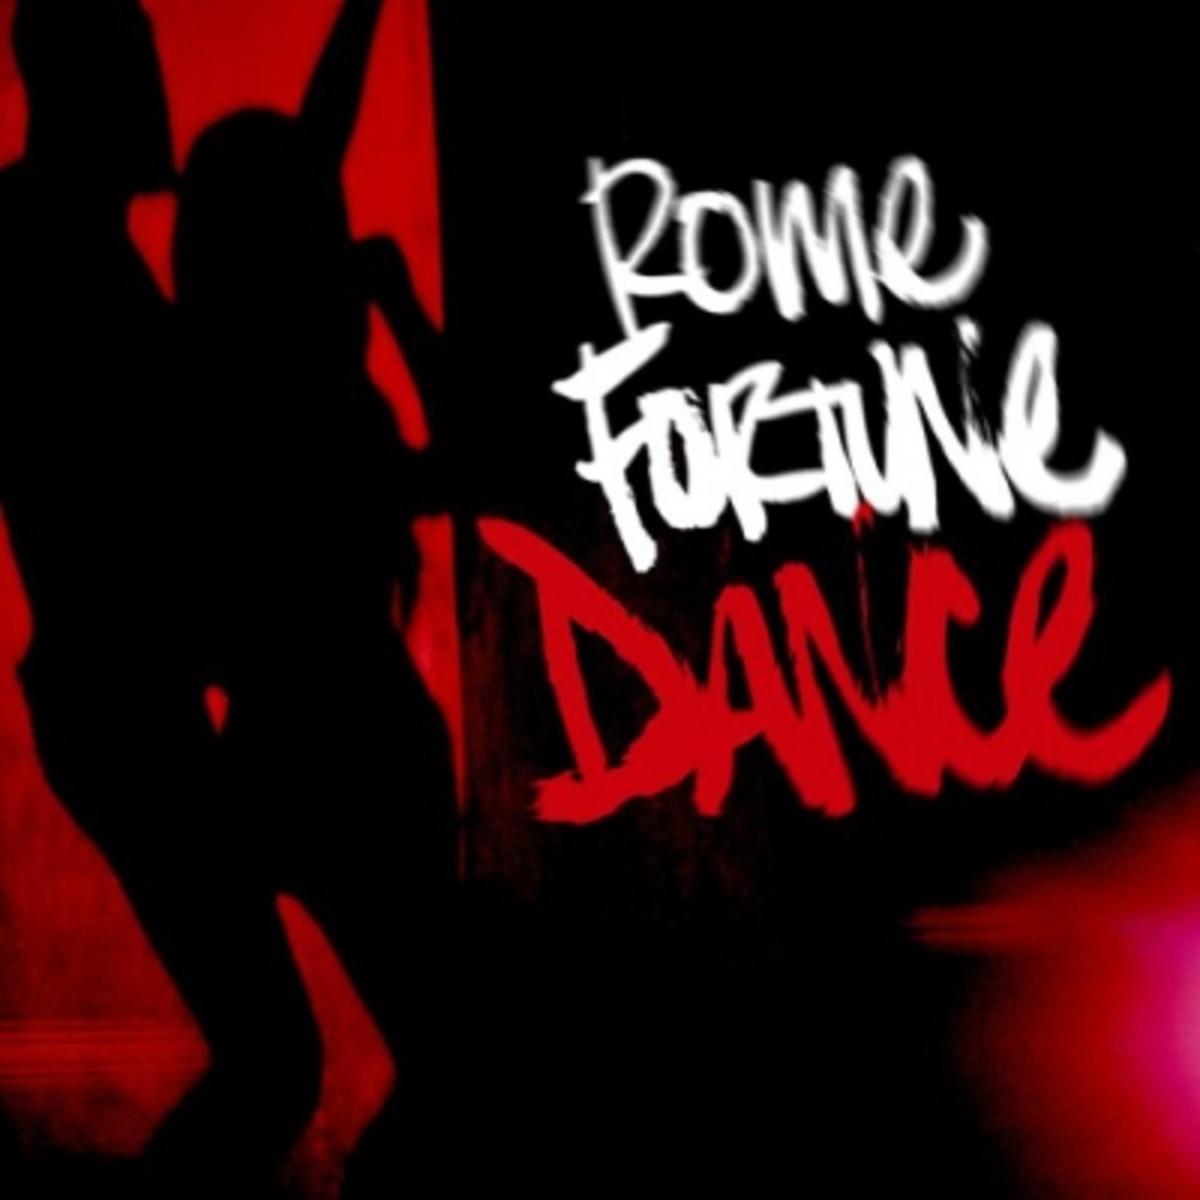 rome-fortune-dance.jpg